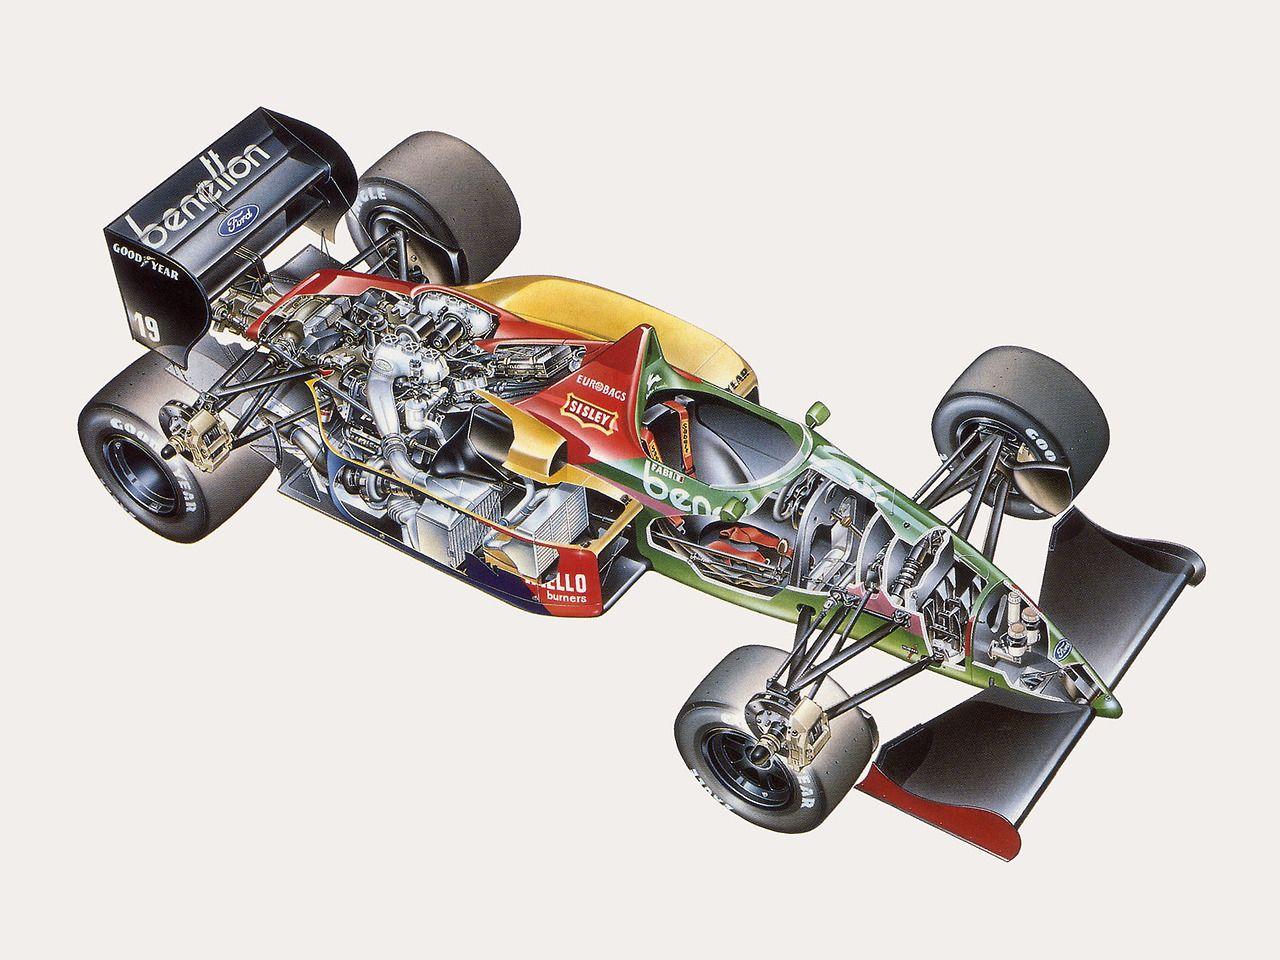 B187 race car cutaway Formule 1, Ricardo, Formule